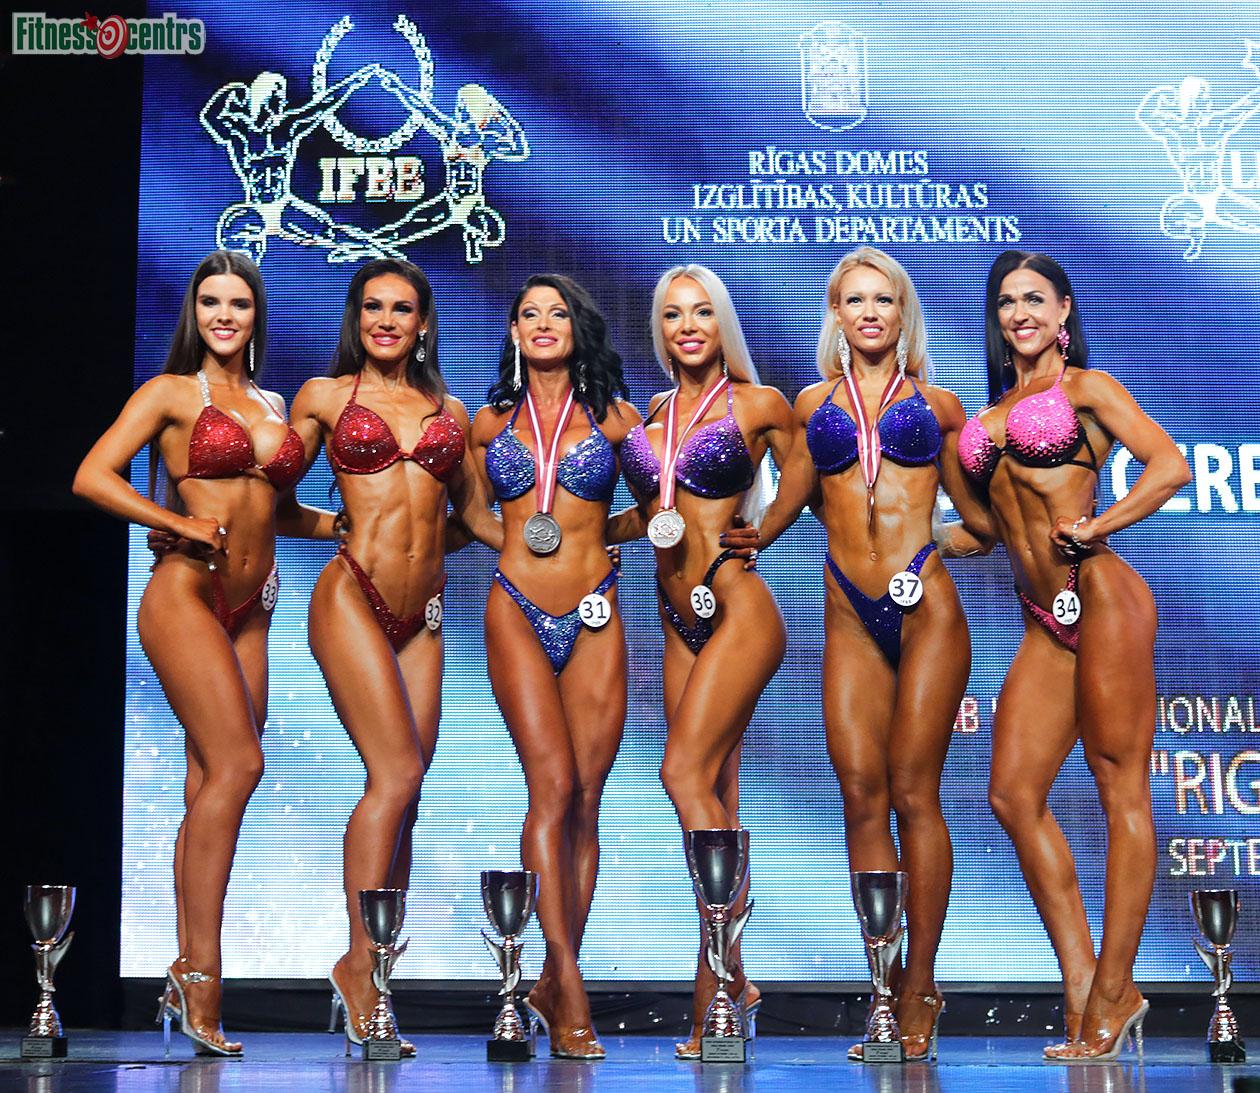 http://img.fitnes.lv/2/IFBB_bikini_2671891_0867.jpg